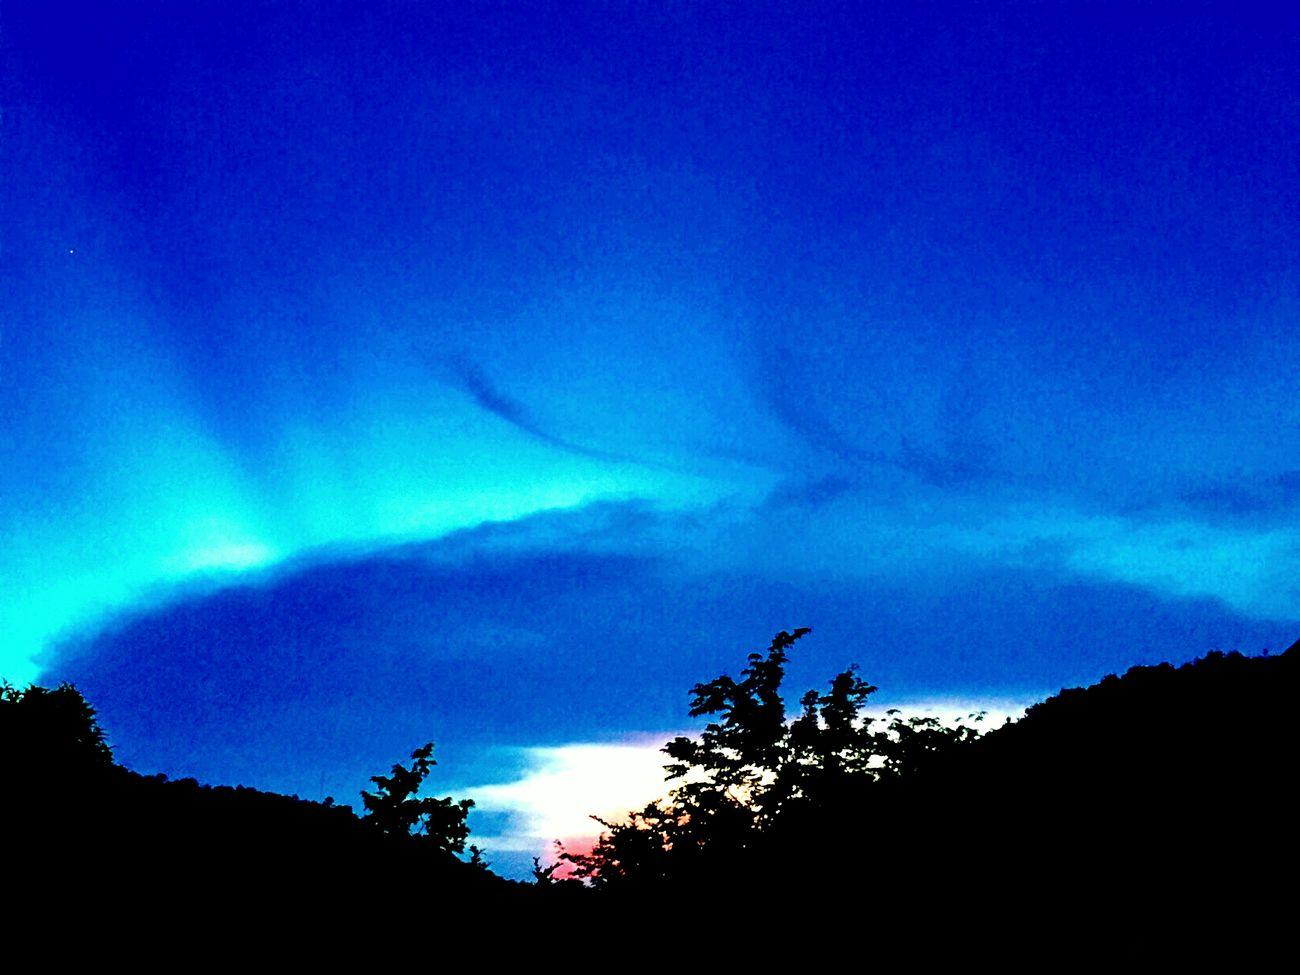 Light of sky